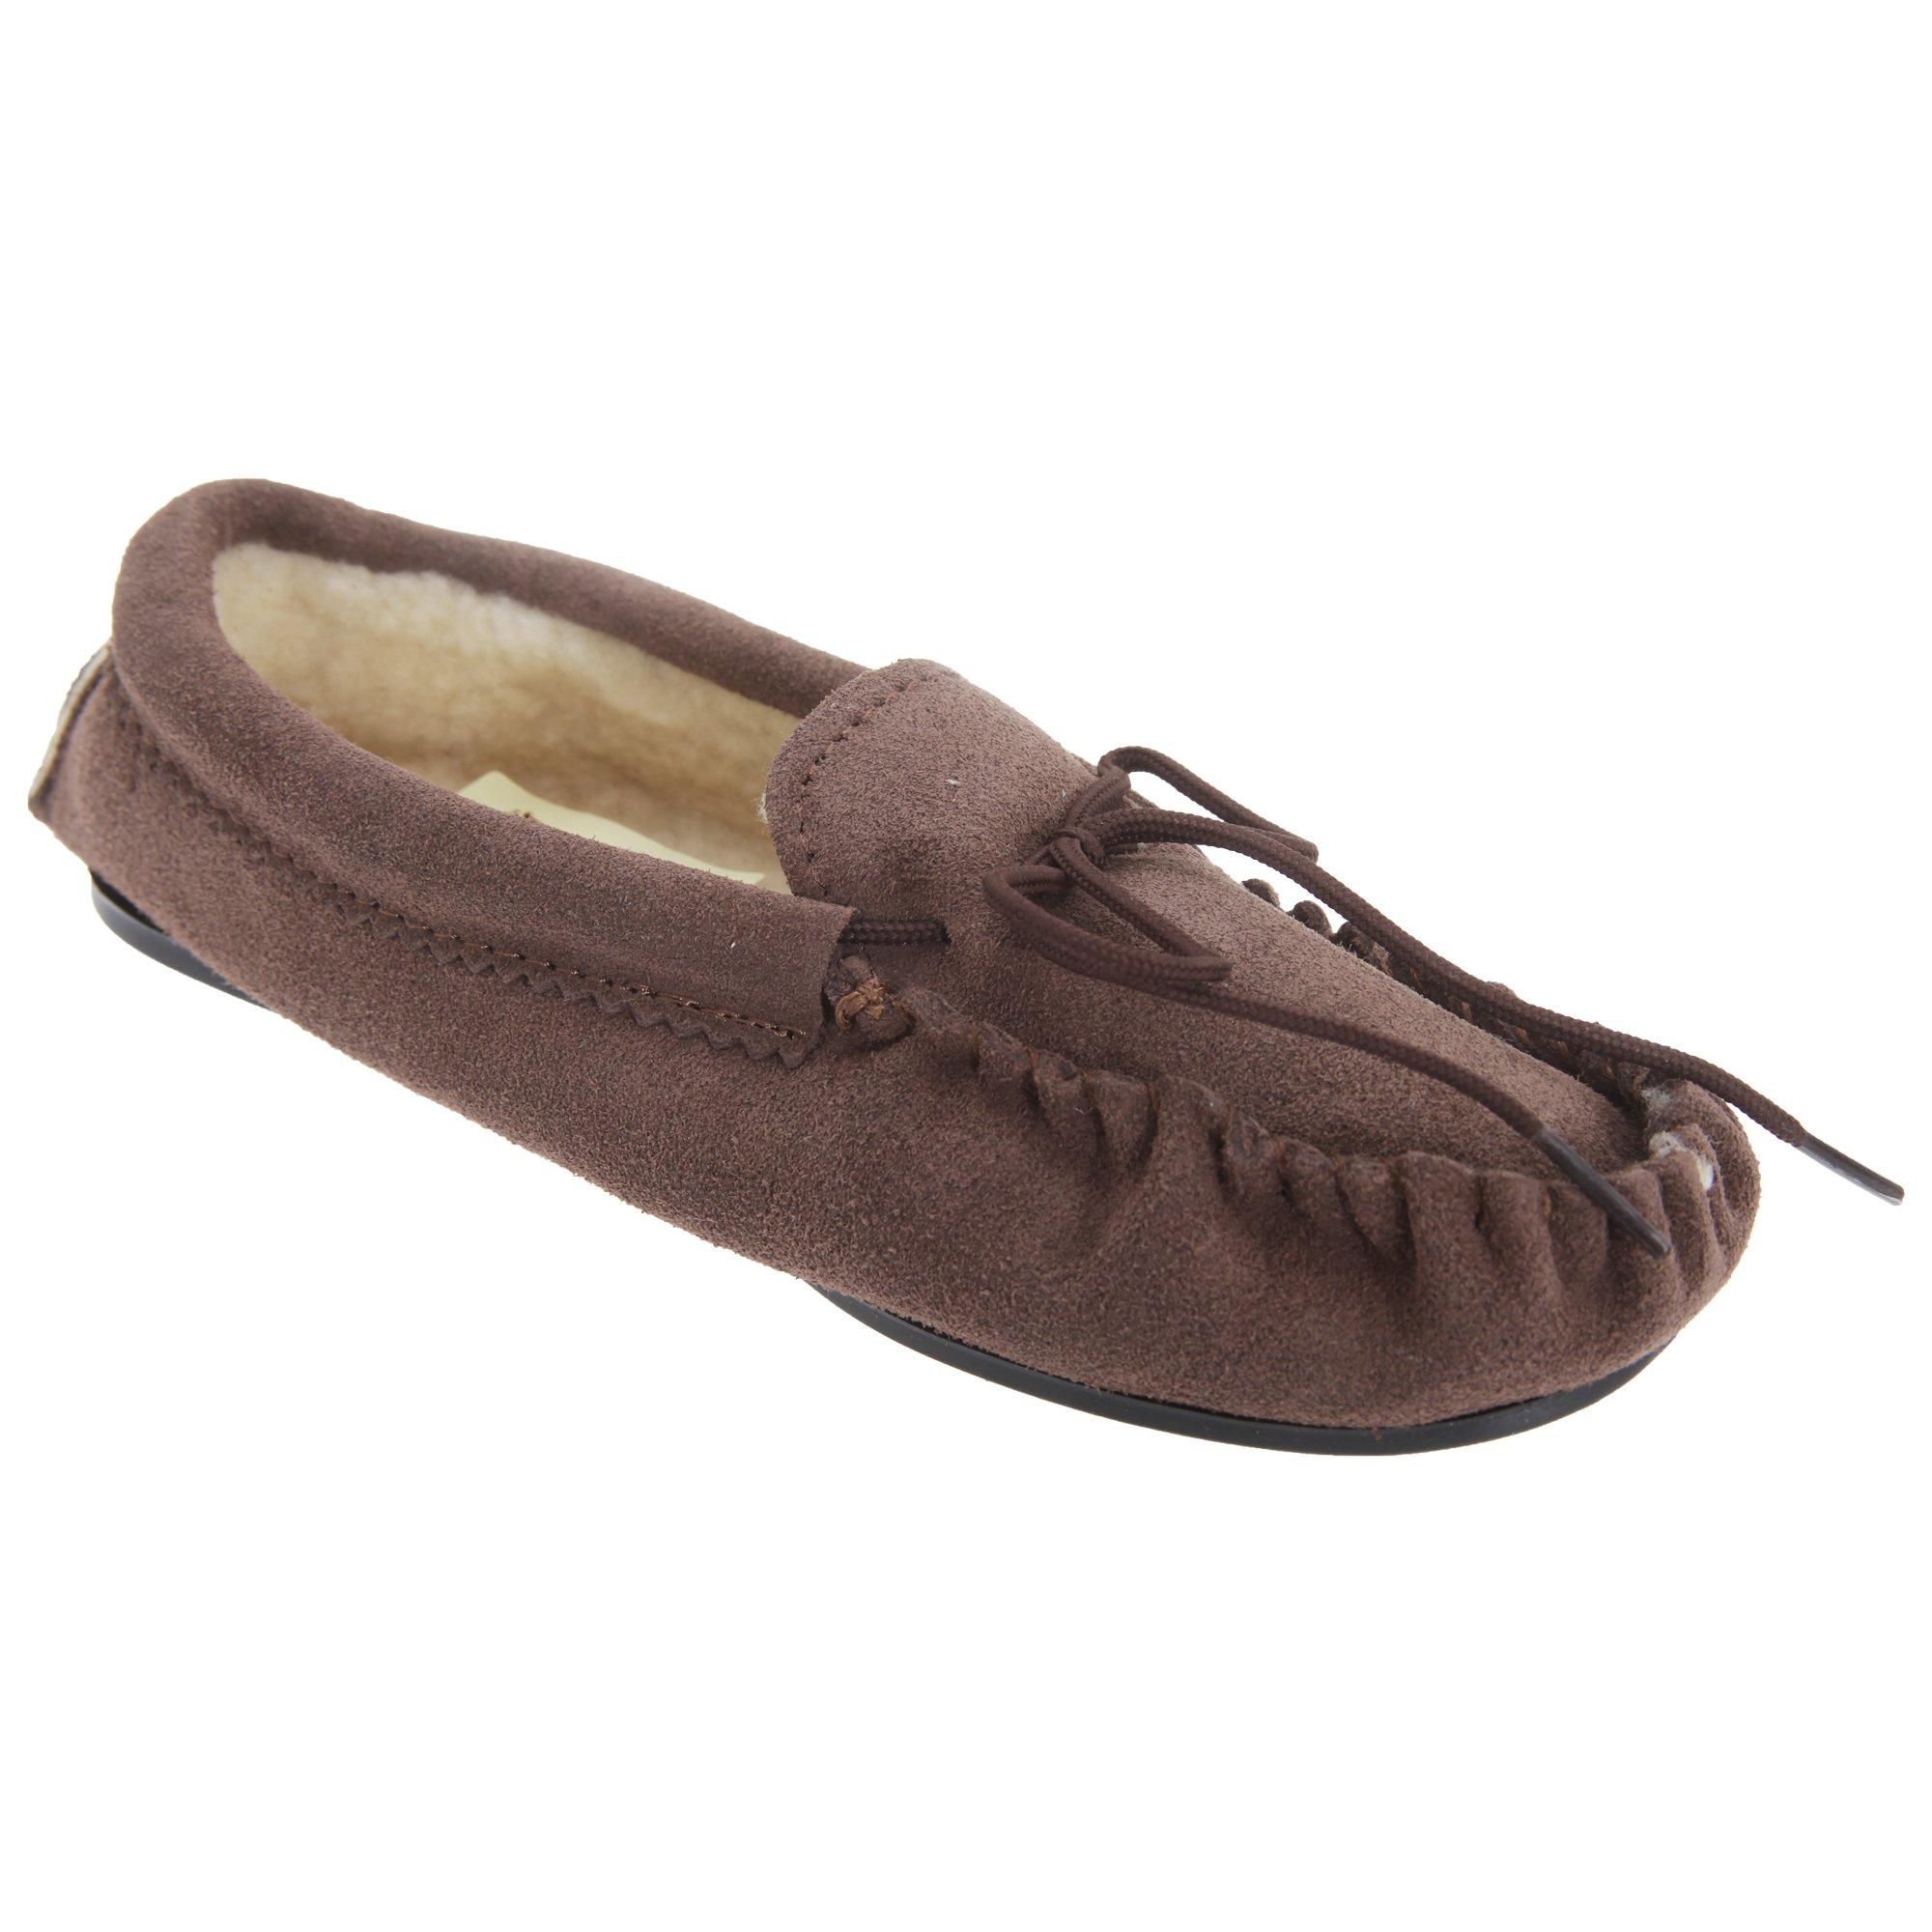 Mokkers Kids Big Boys Sheridan Moccasin Real Suede Slippers (5 US) (Dark Taupe)